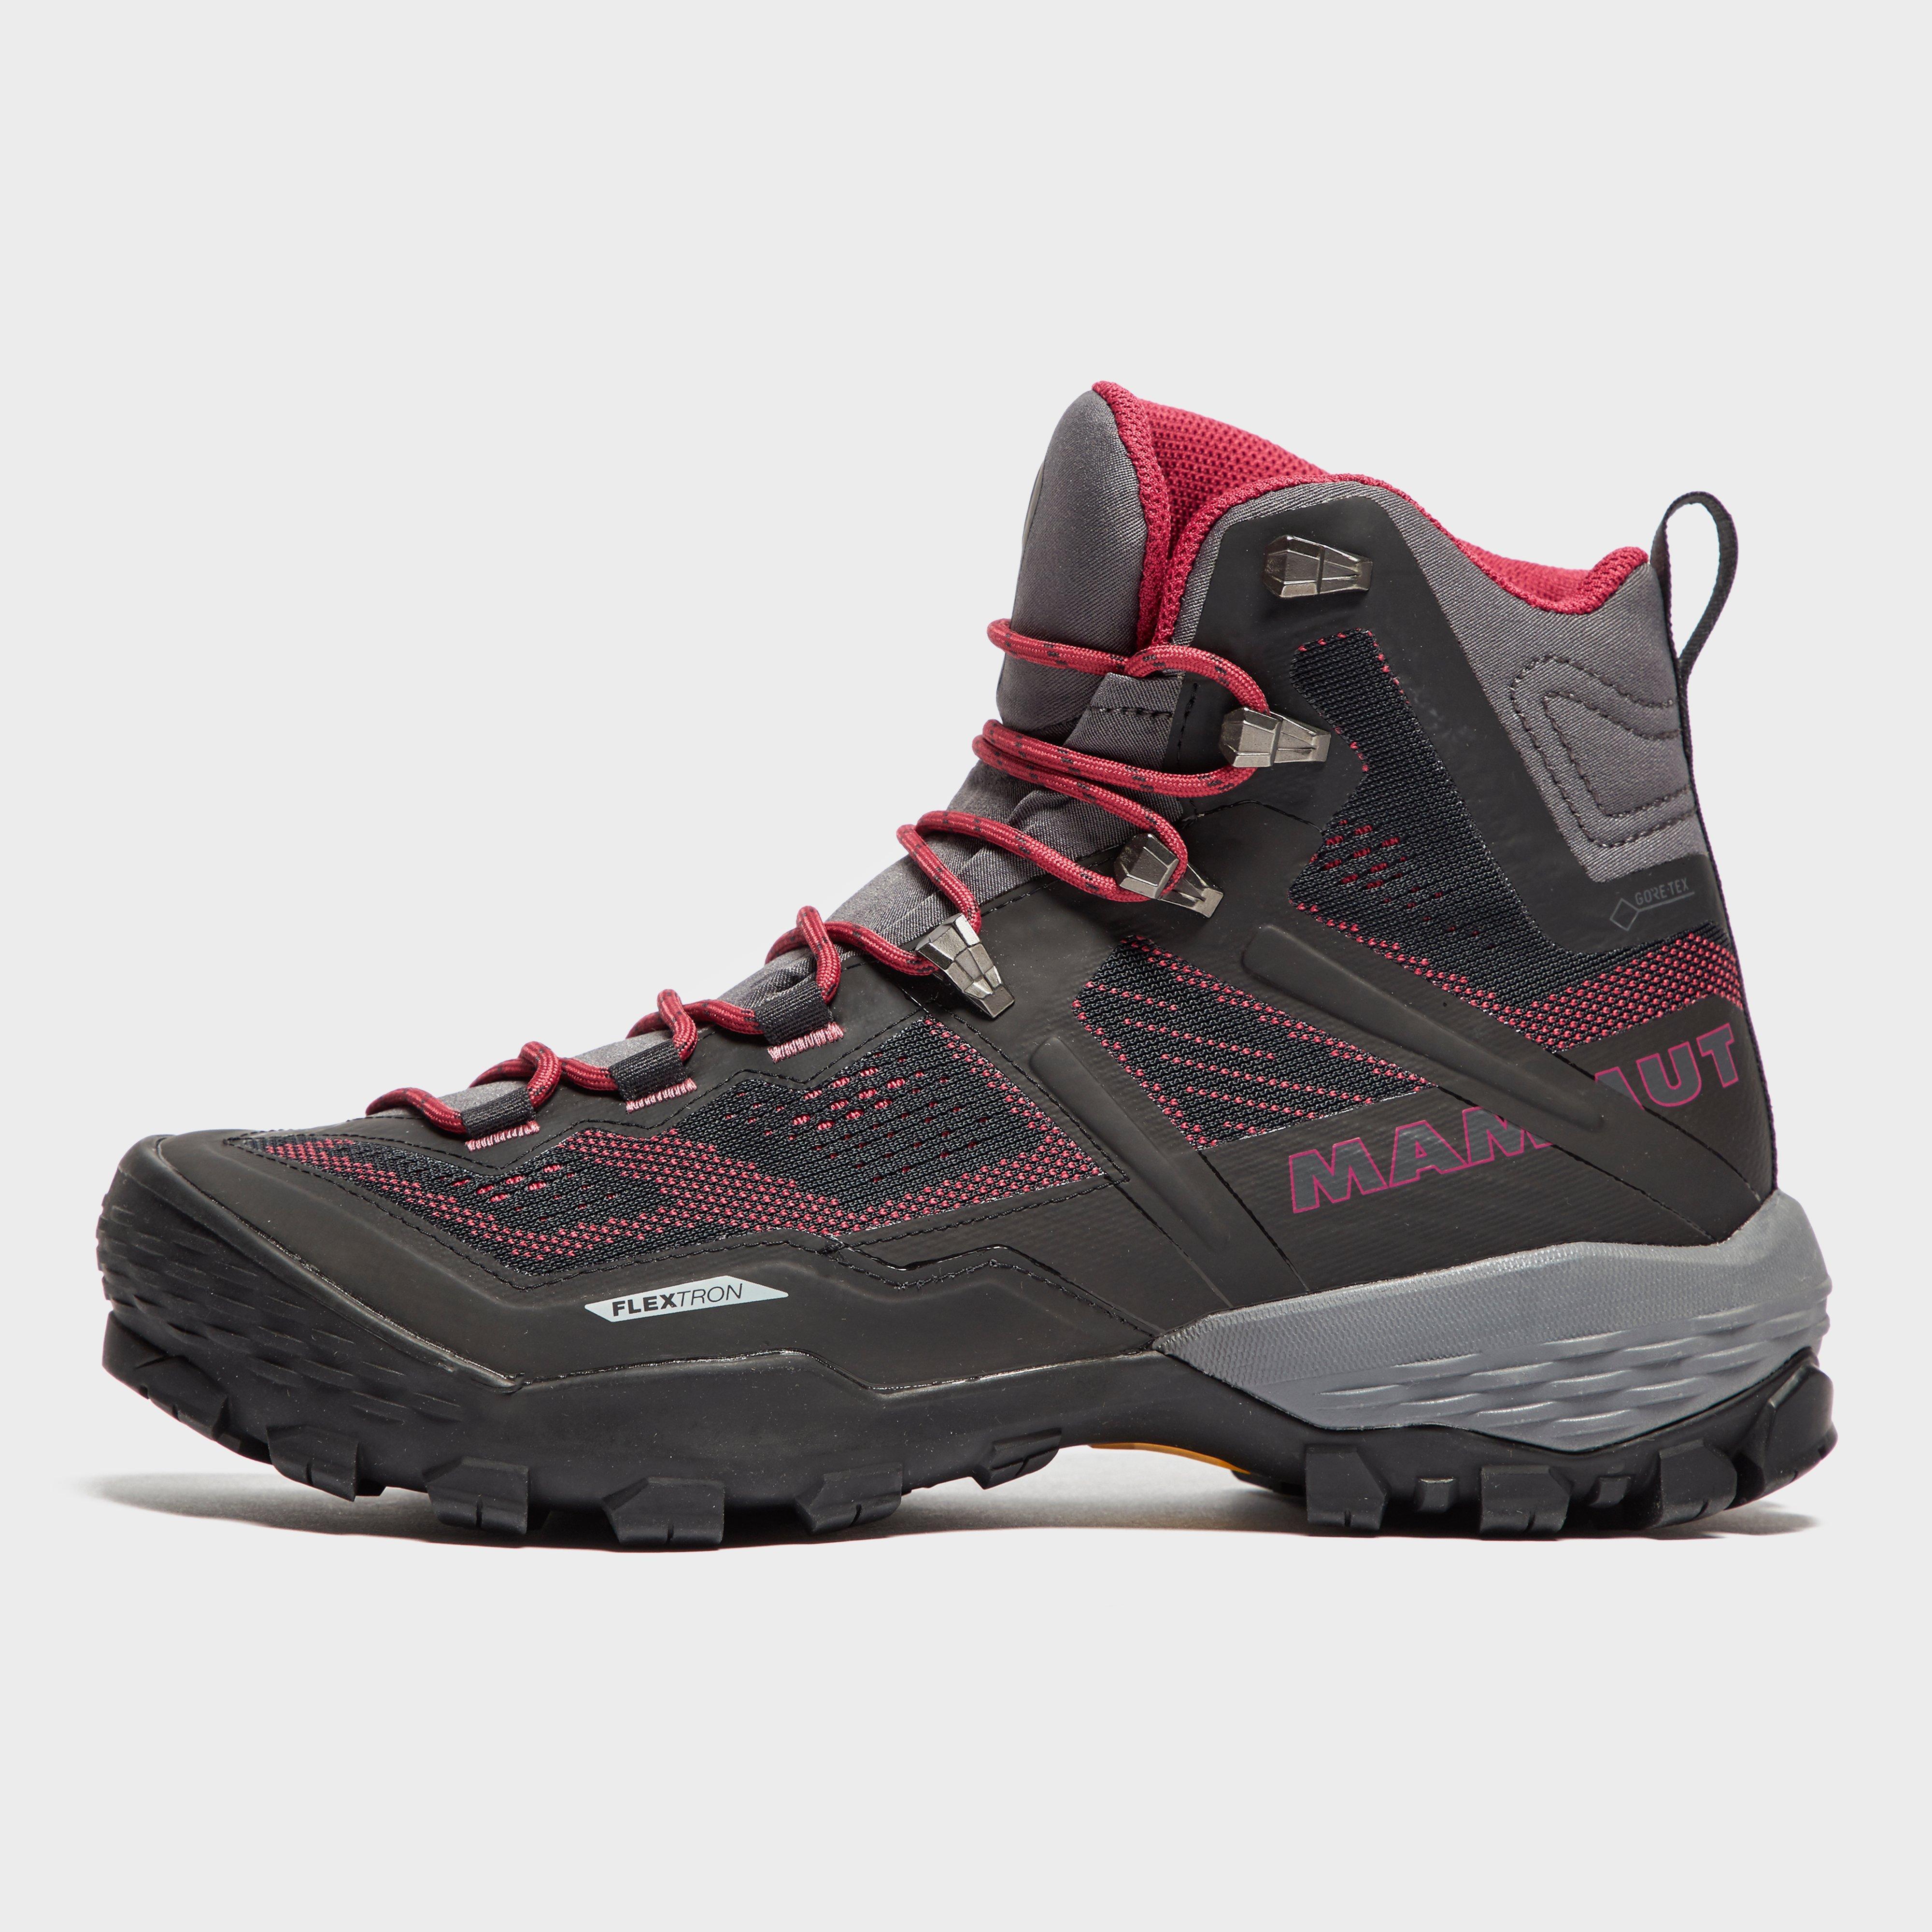 best service 7b1bc 408b8 Women's Ducan High GORE-TEX® Walking Boots